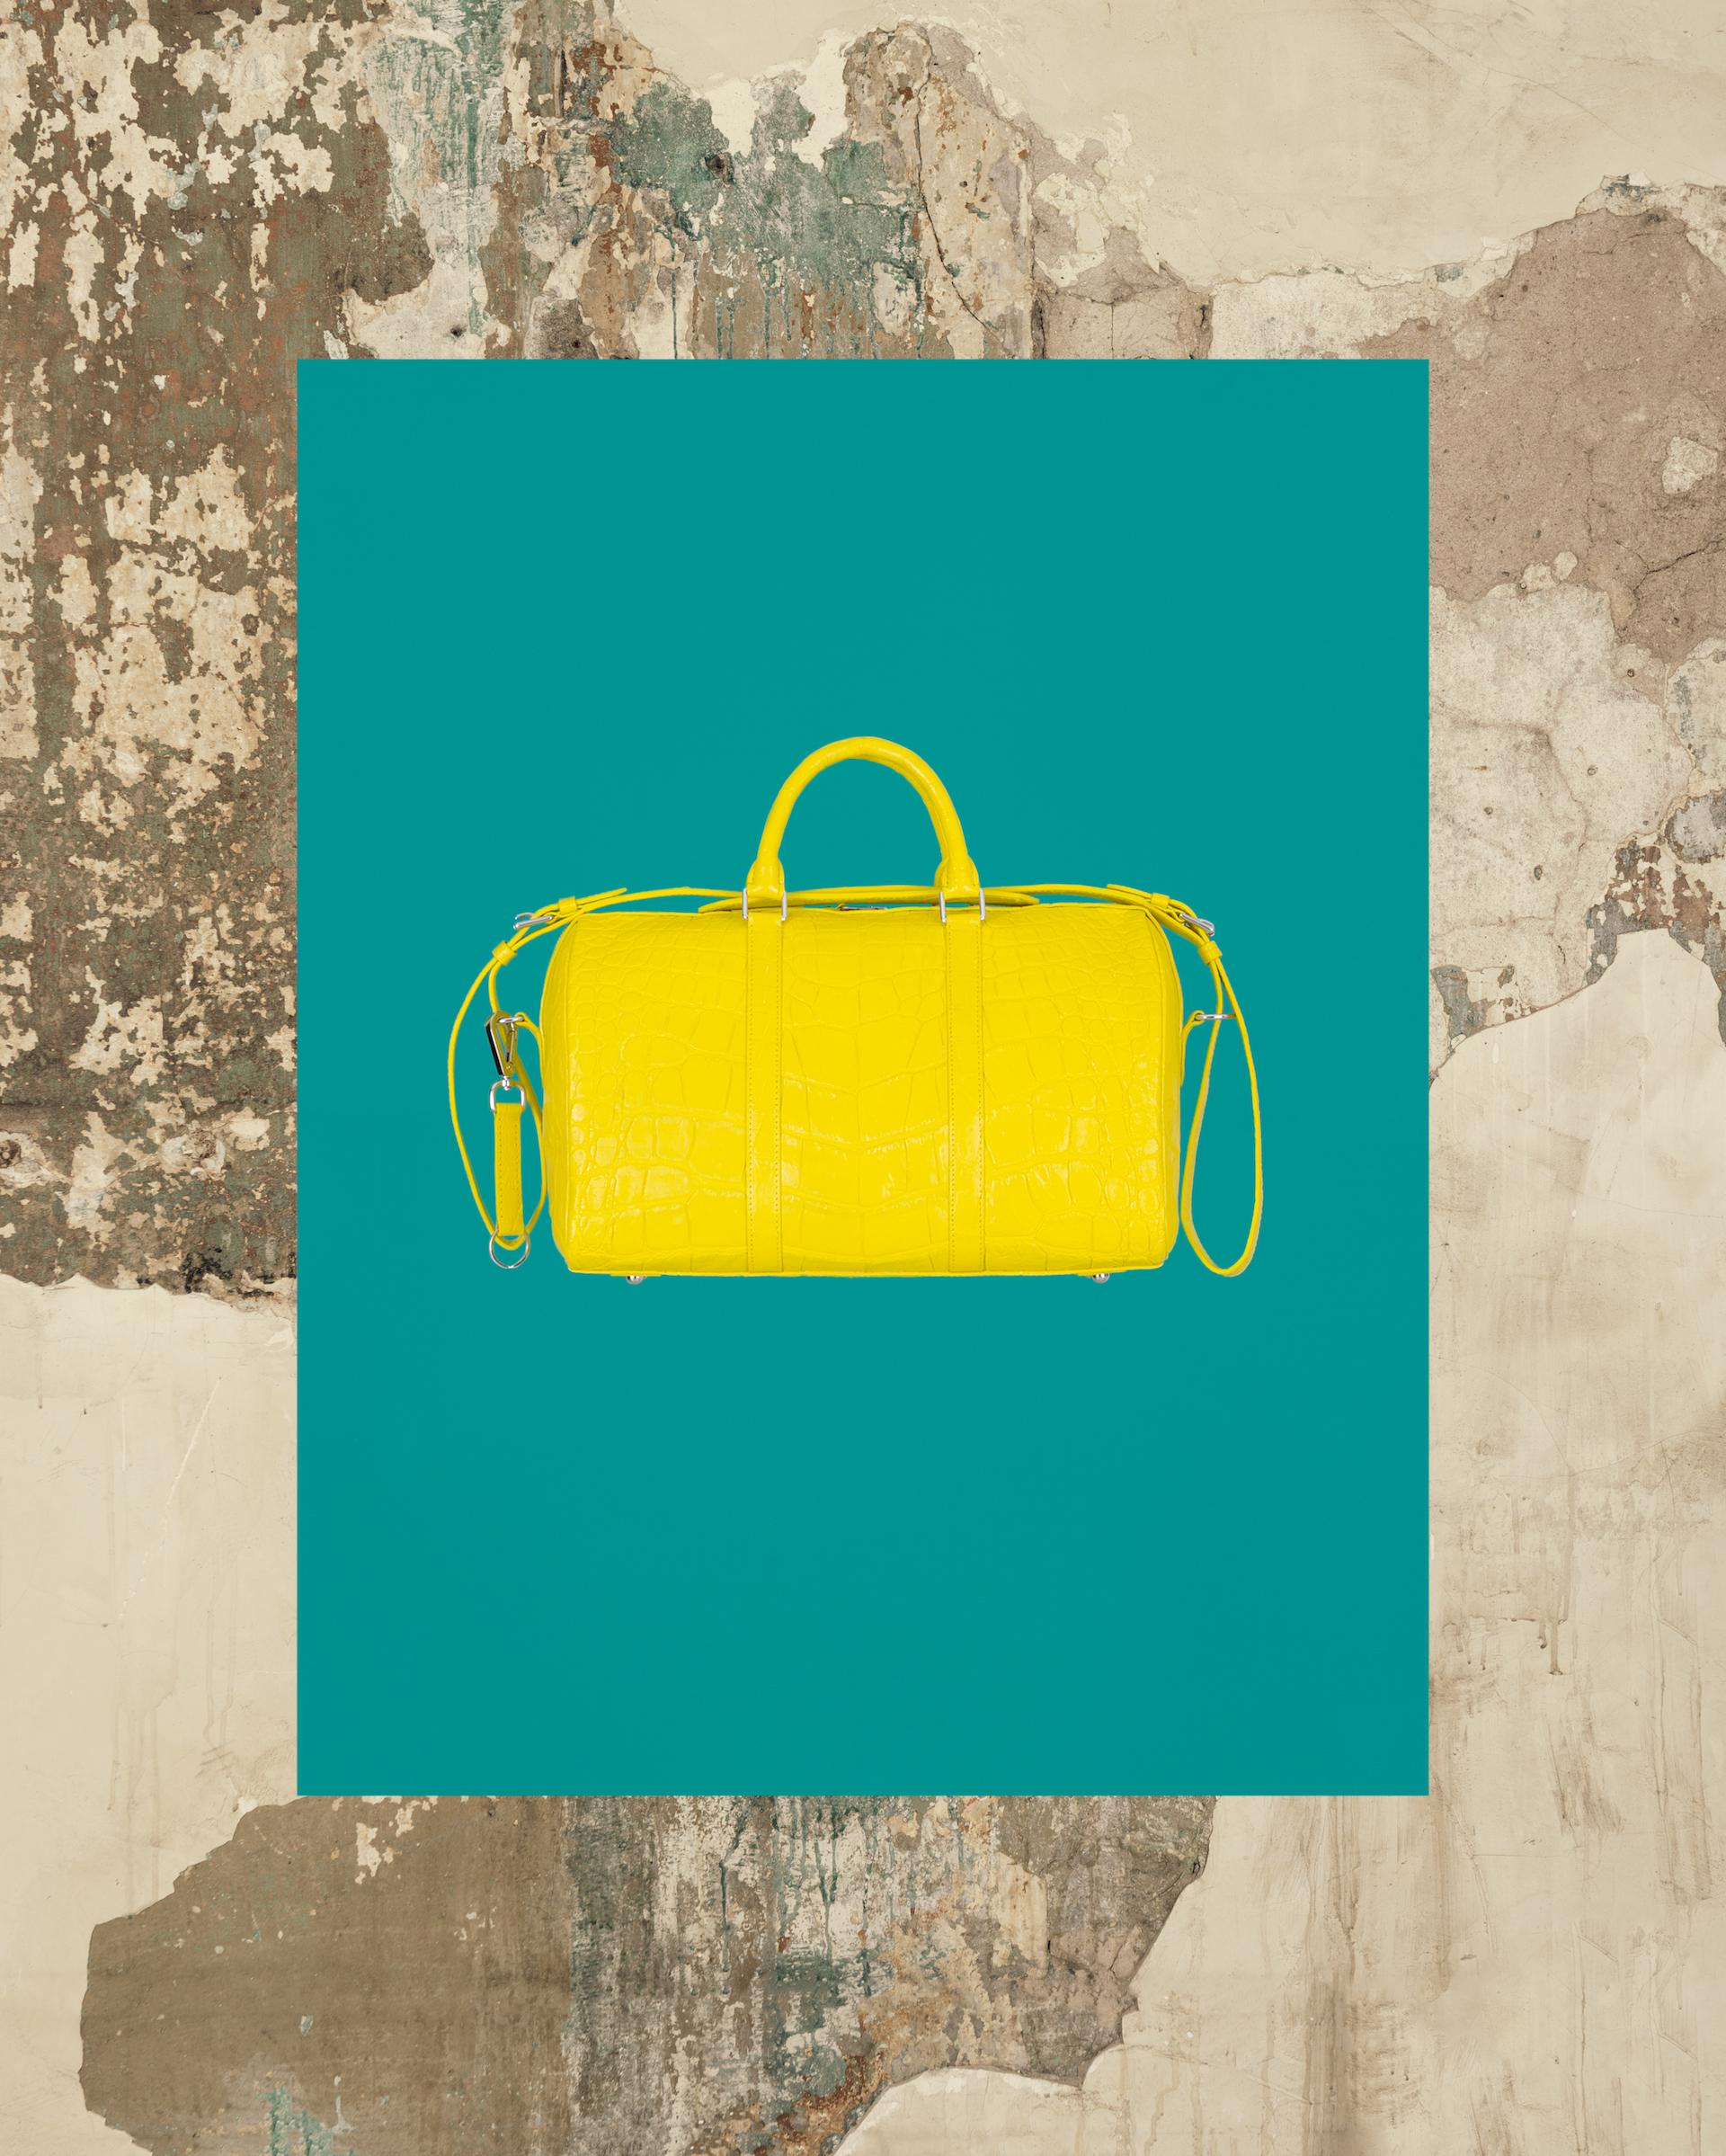 Gator_yellow_bag_front.jpg